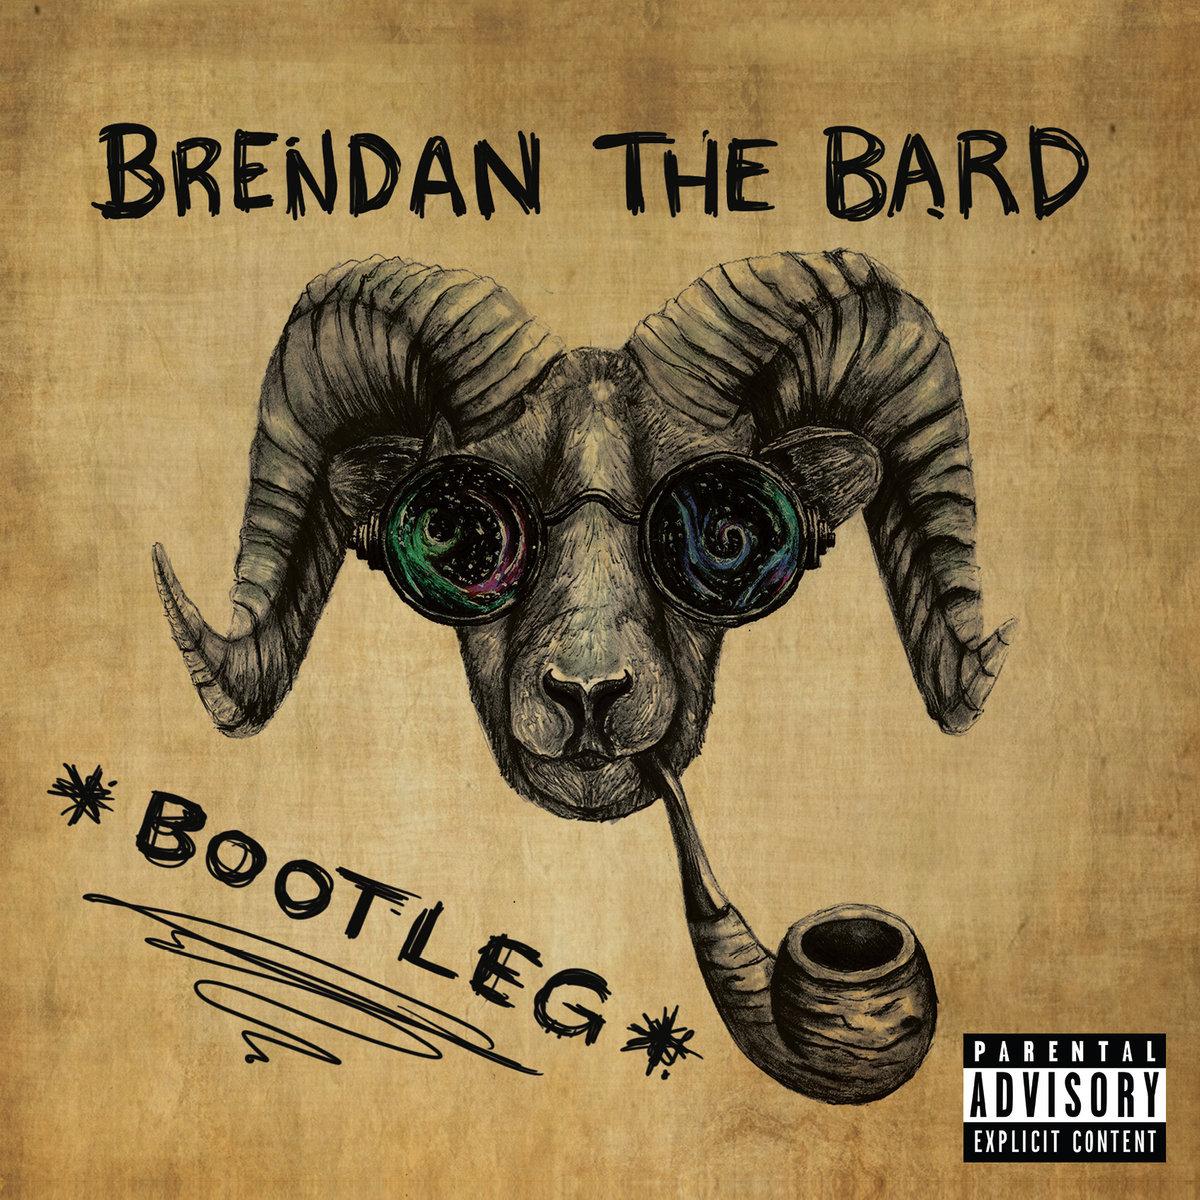 Bootleg | Bard of Brunswick